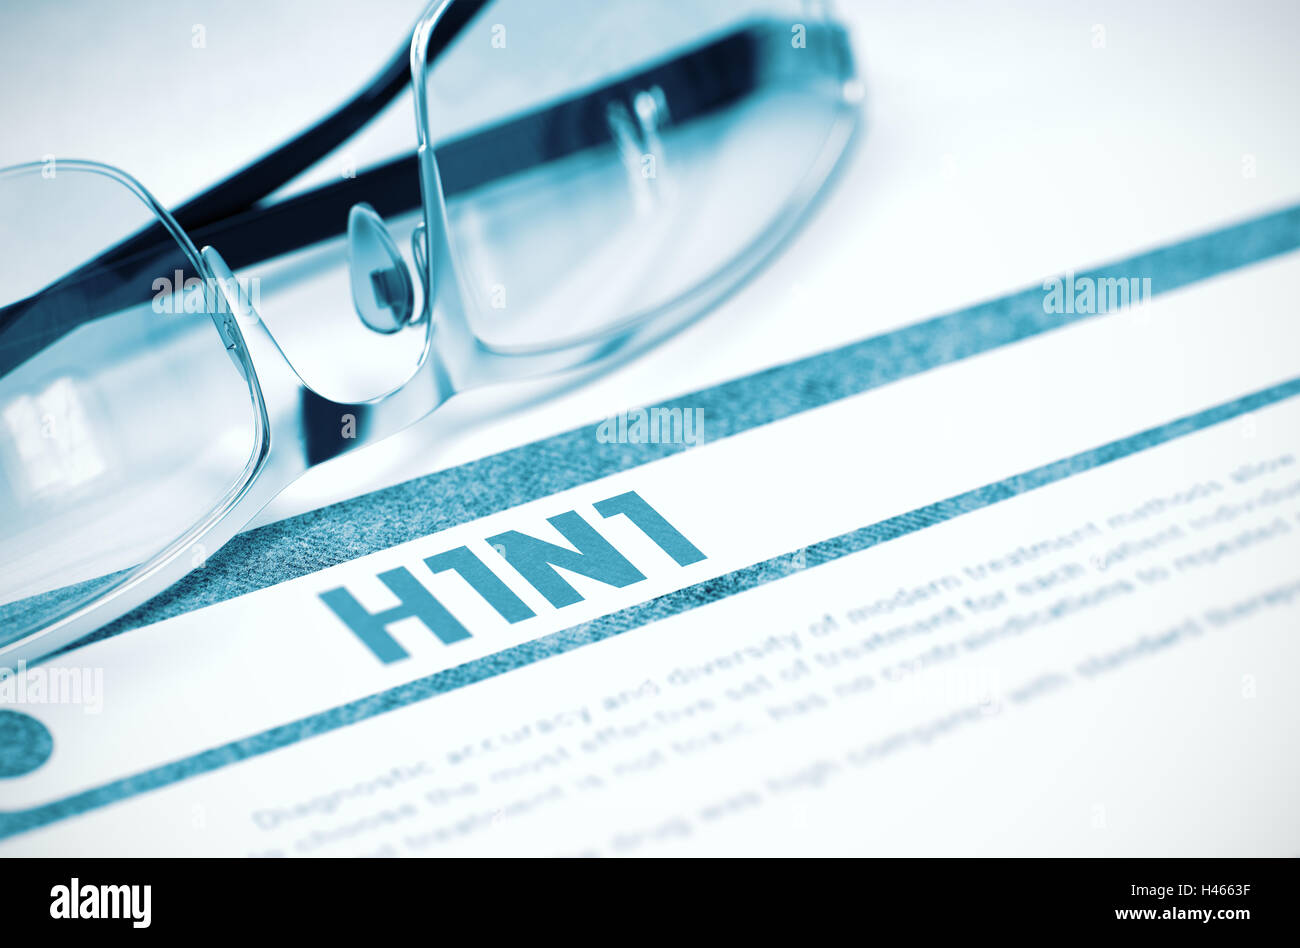 Diagnosis - H1N1. Medicine Concept. 3D Illustration. - Stock Image